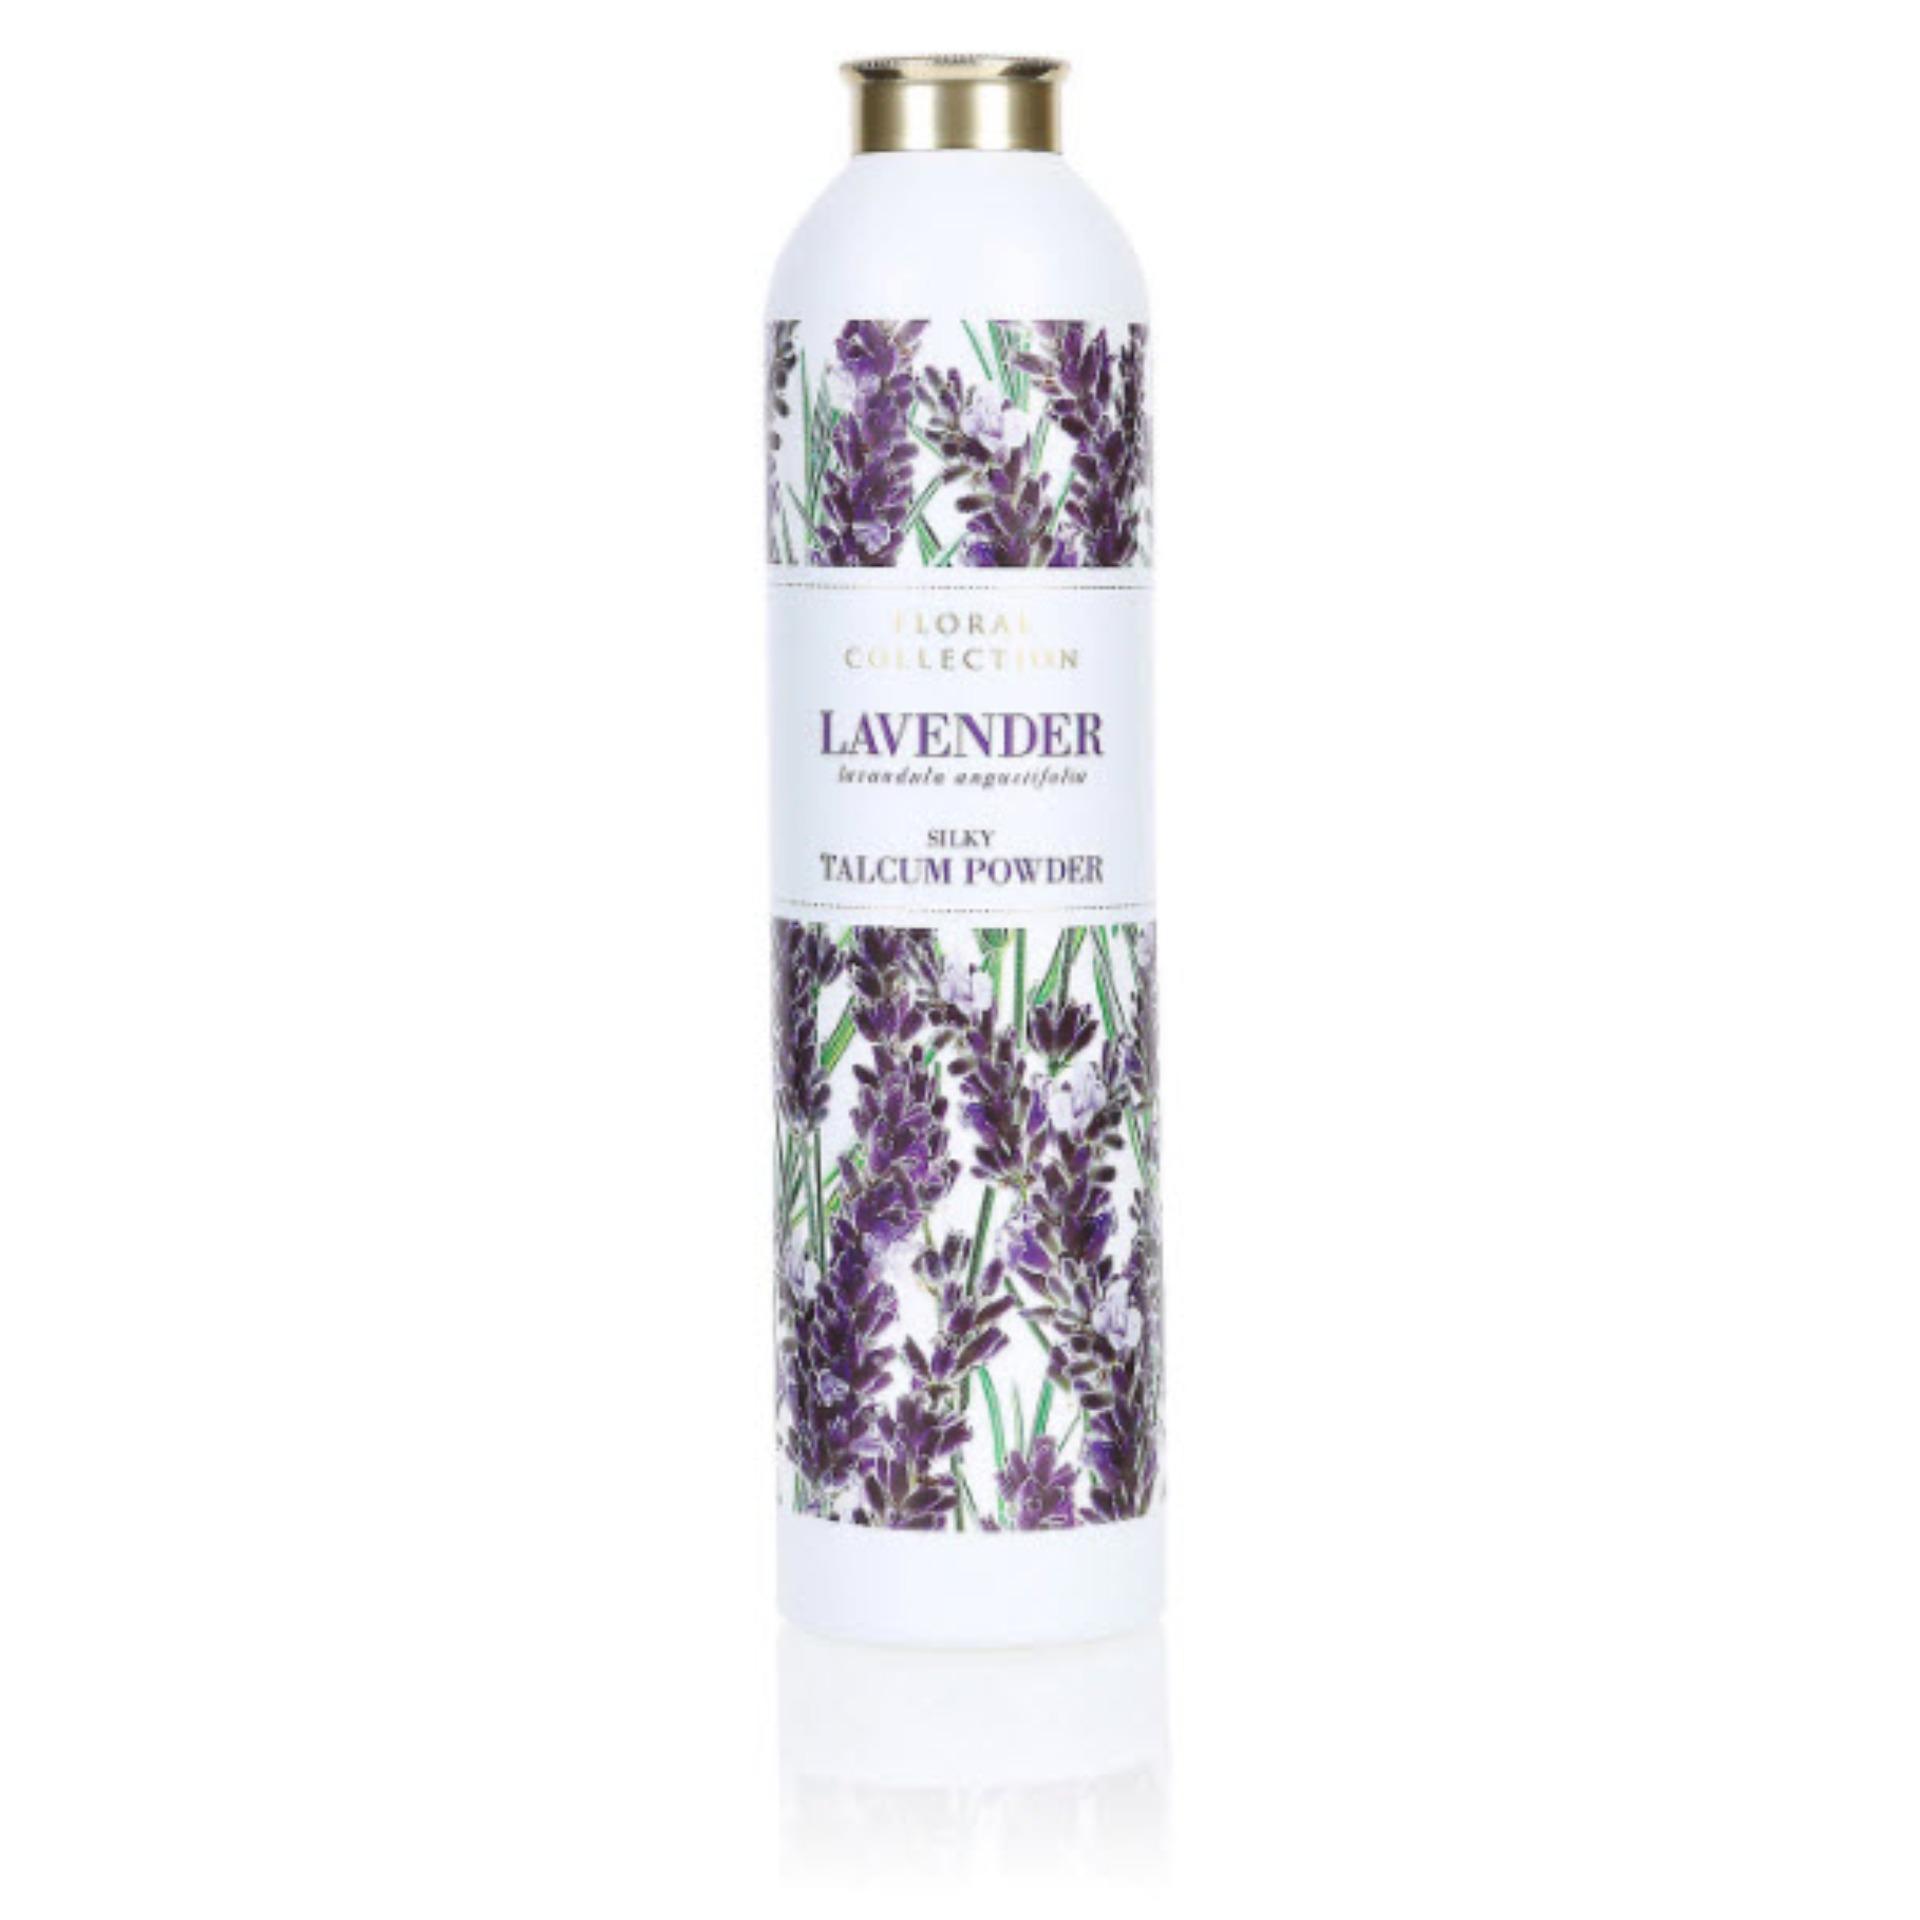 Herocyn Baby Powder 200 Gr Bedak Biang Keringat Mengurangi Iritasi Gatal 150 Marks Spencer Talcum Tabur Lavender